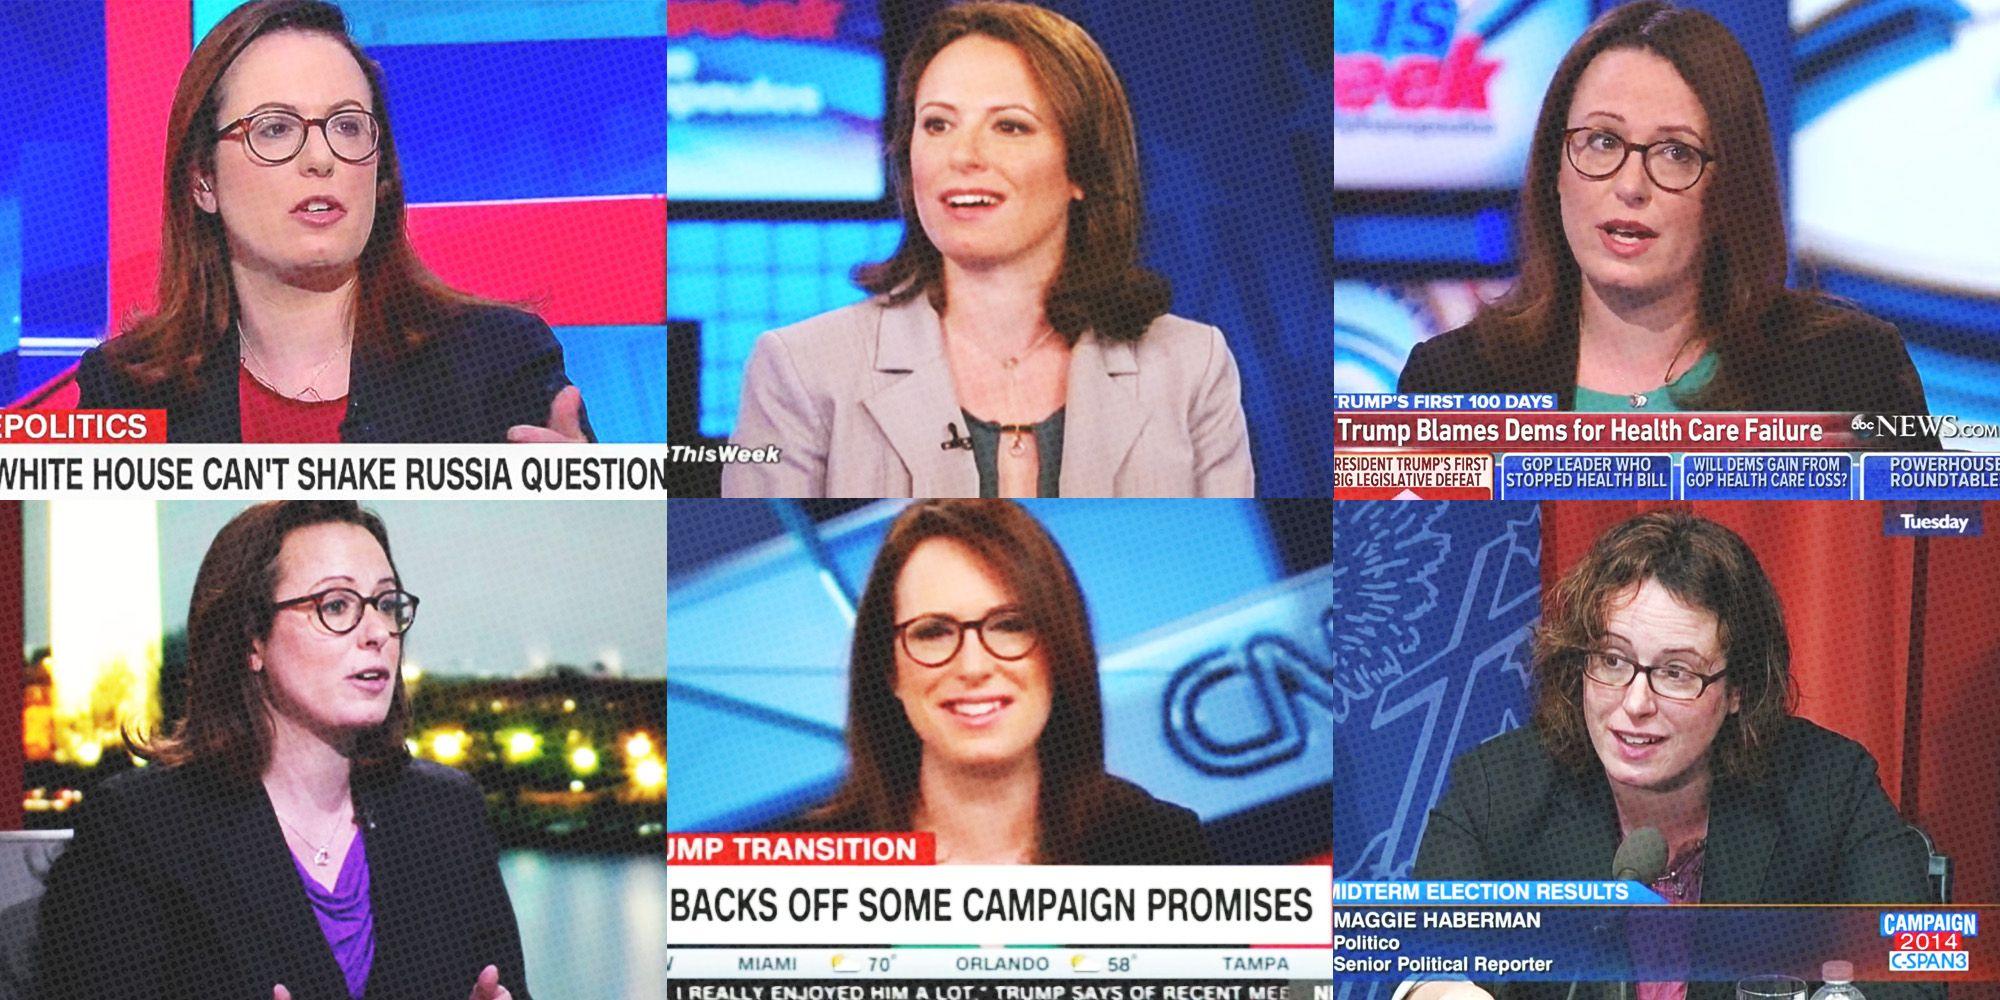 Maggie Haberman Profile - How Maggie Haberman Covers Donald